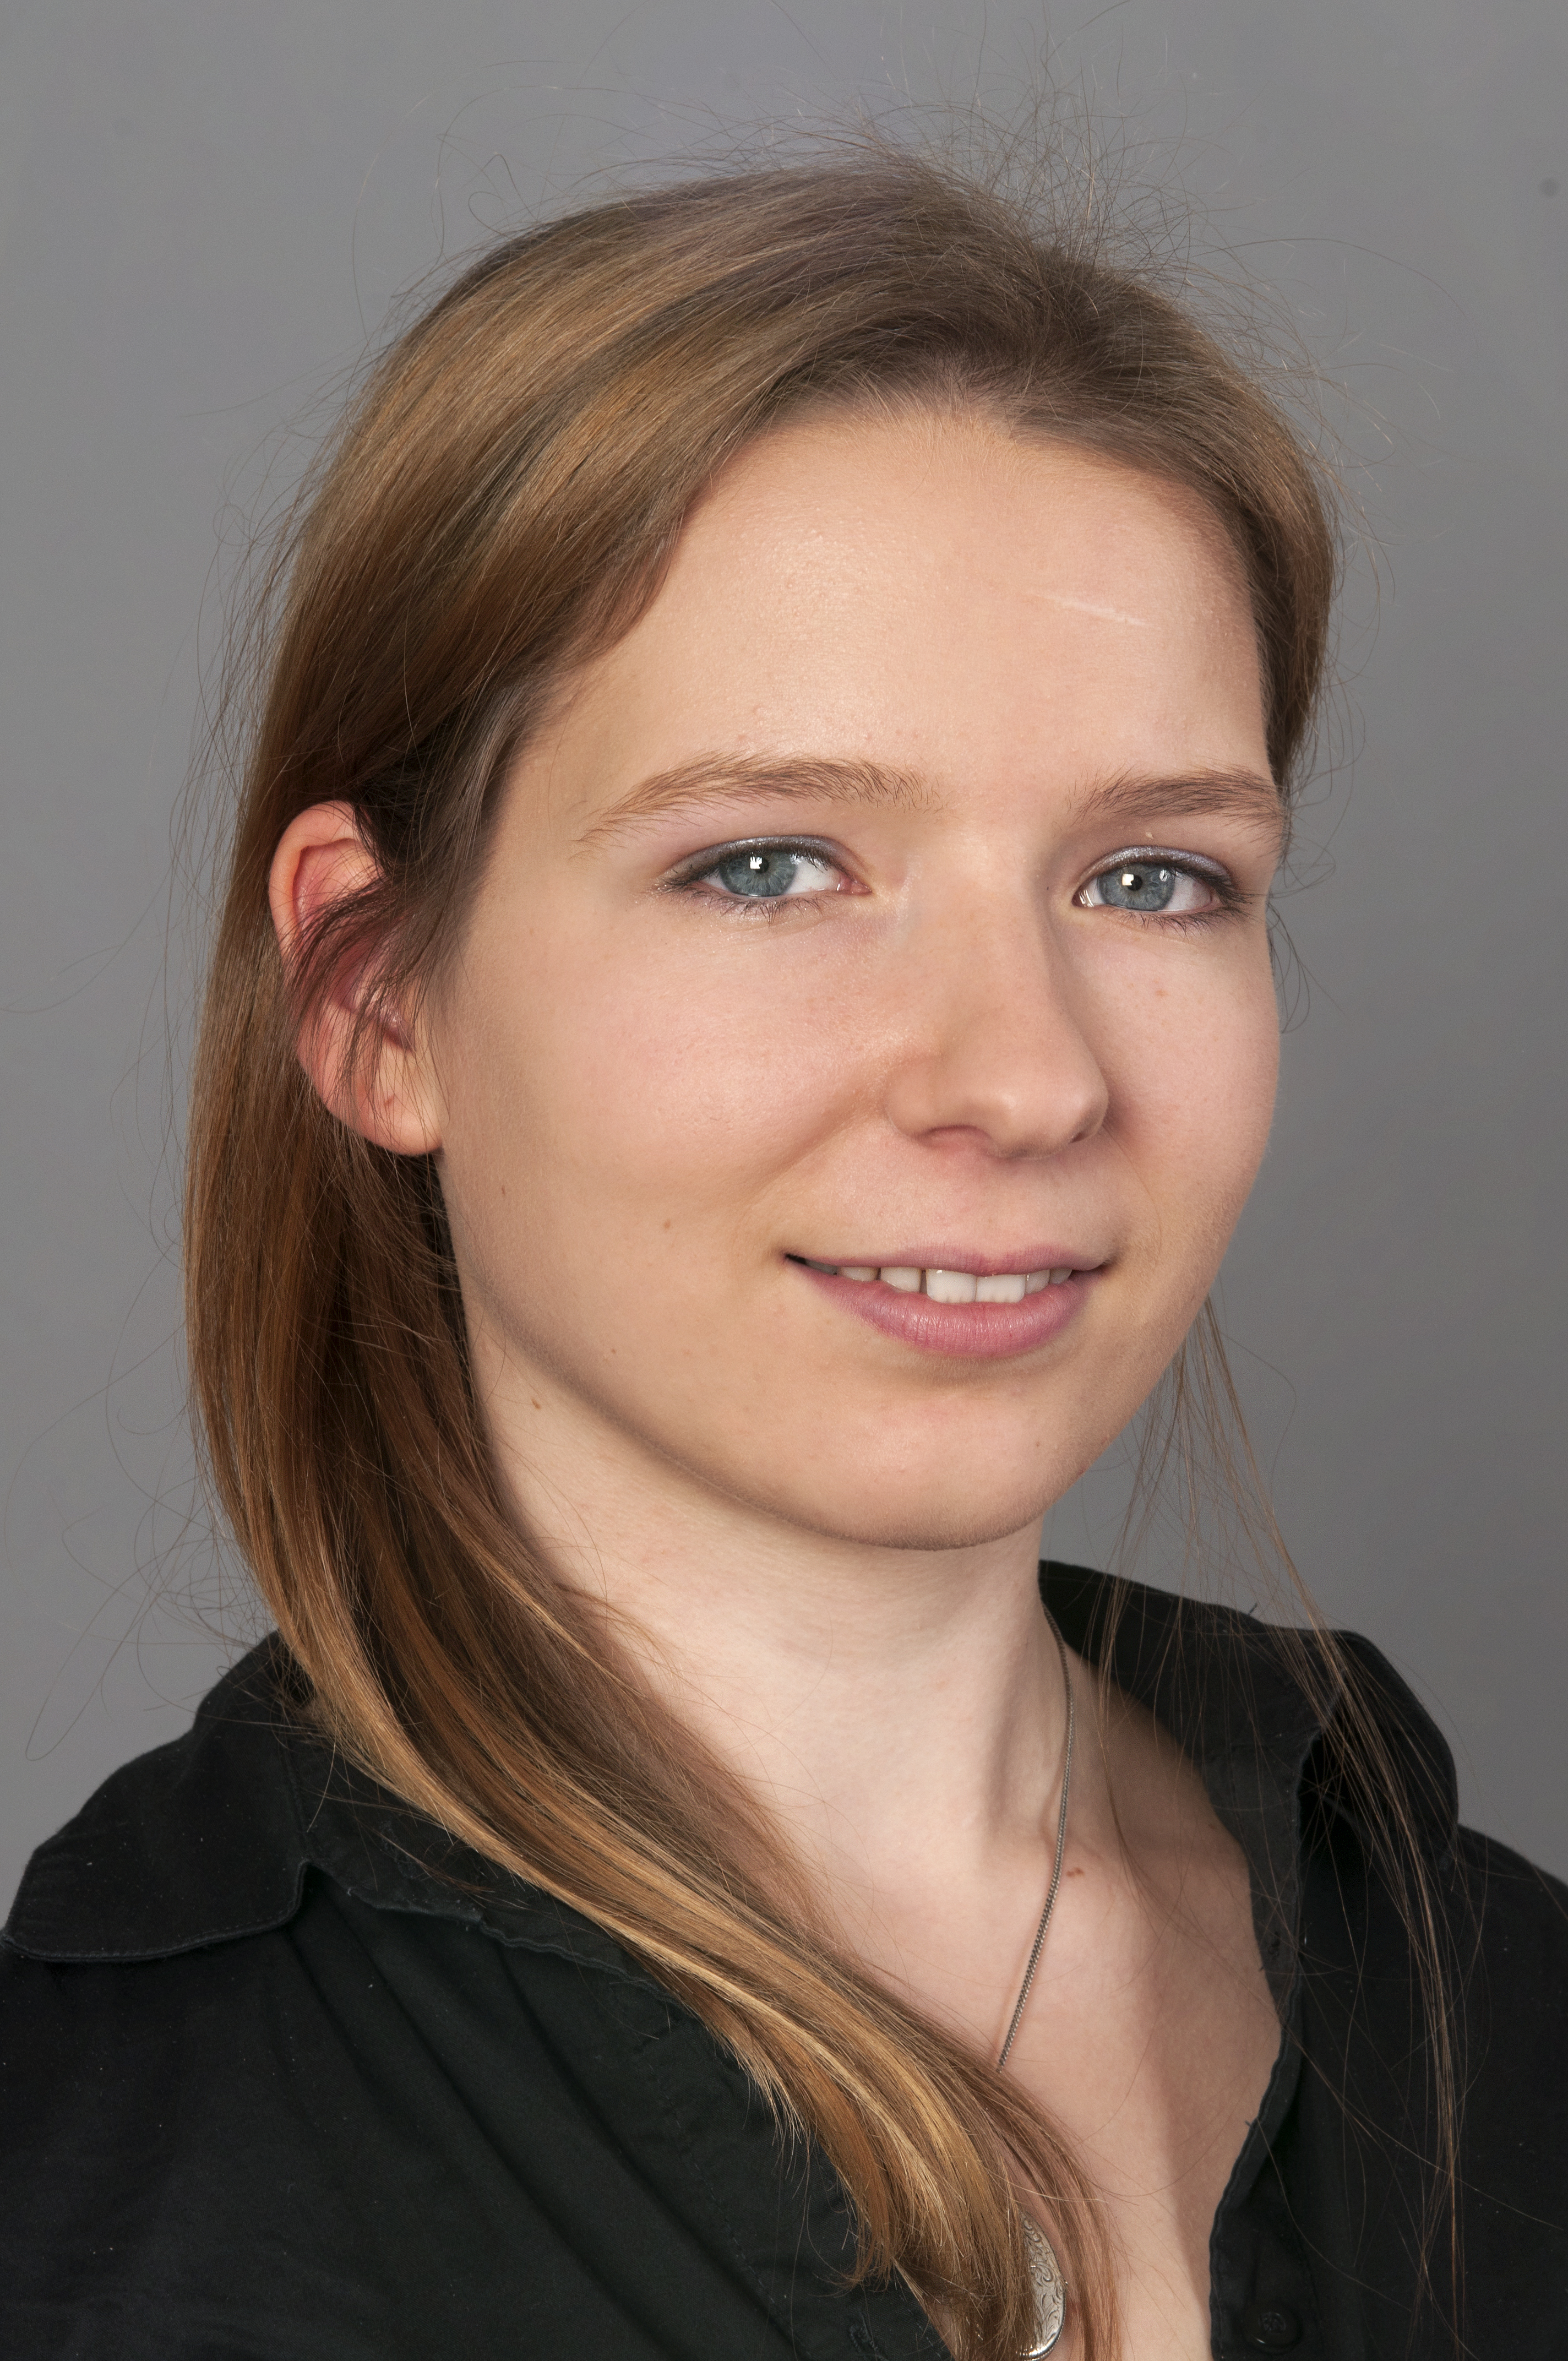 Susanne Graf (2015)